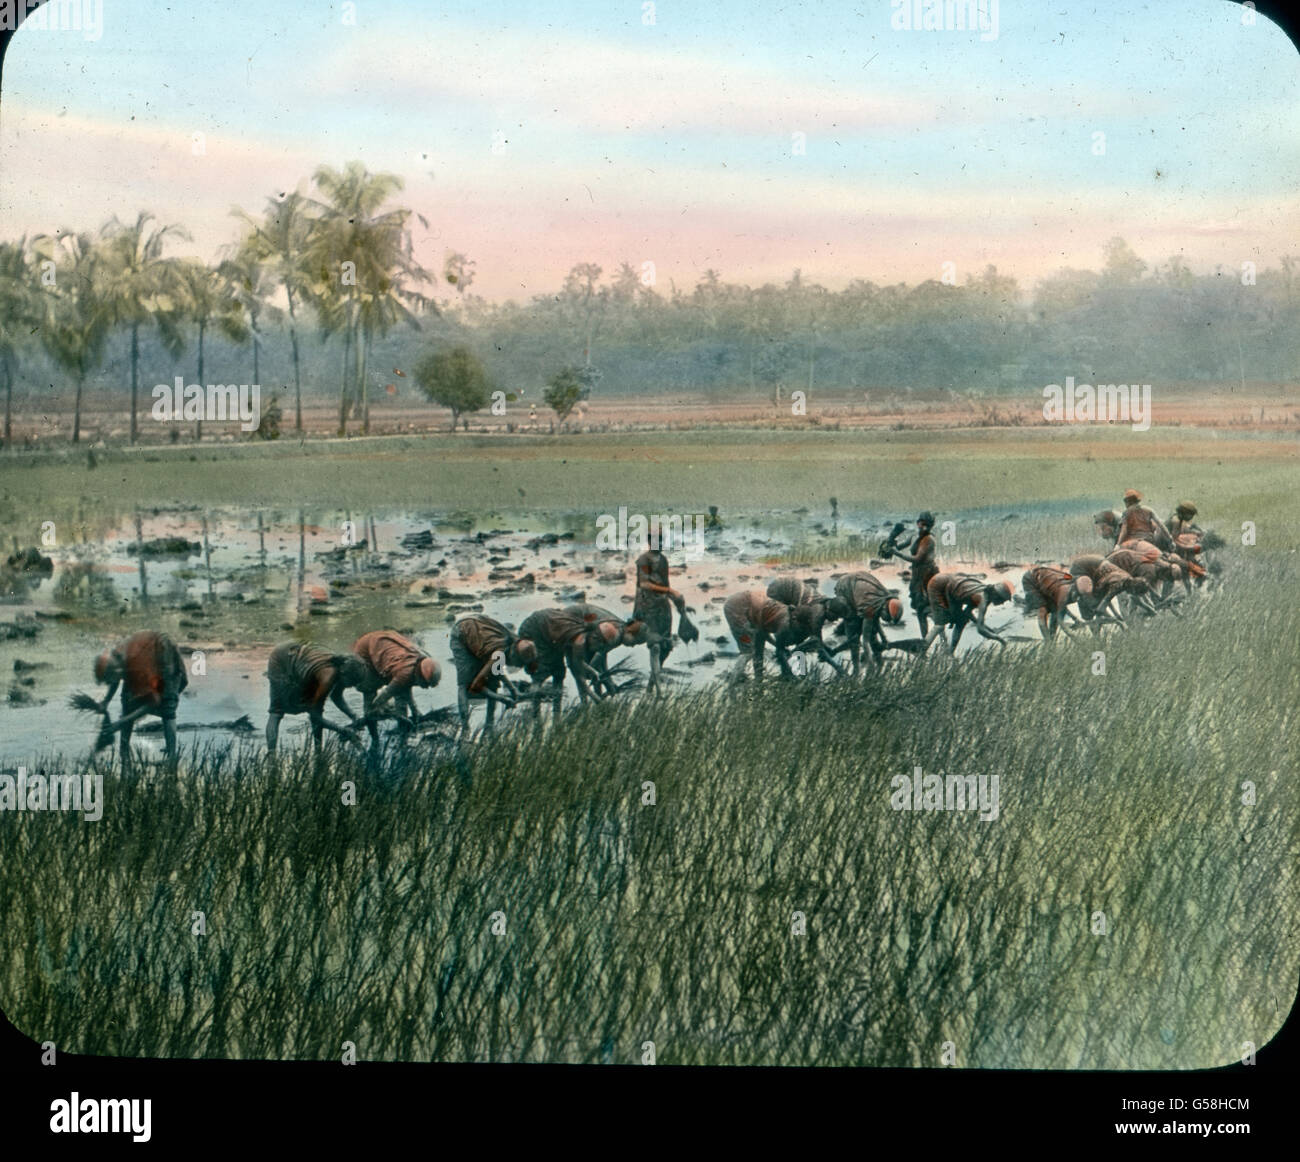 Bauern pflanzen Reis als Ernährungsgrundlage an. India, Asia, travel, farmer, rice, food, seed, 1910s, 20th - Stock Image